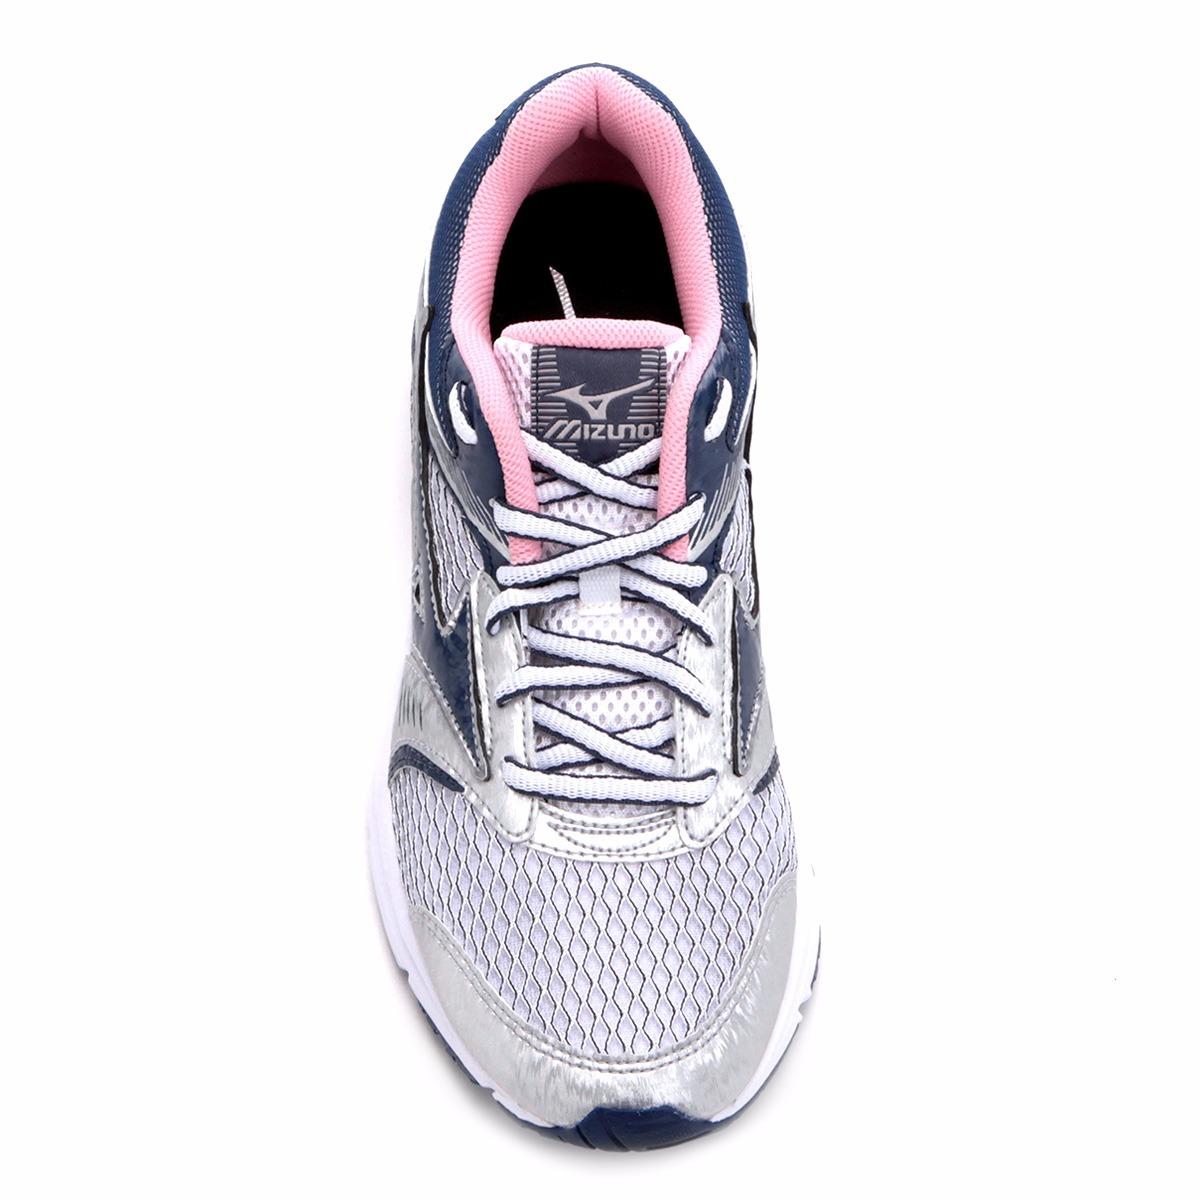 045861eb915 tenis mizuno strike n feminino prata com rosa e azul. Carregando zoom.